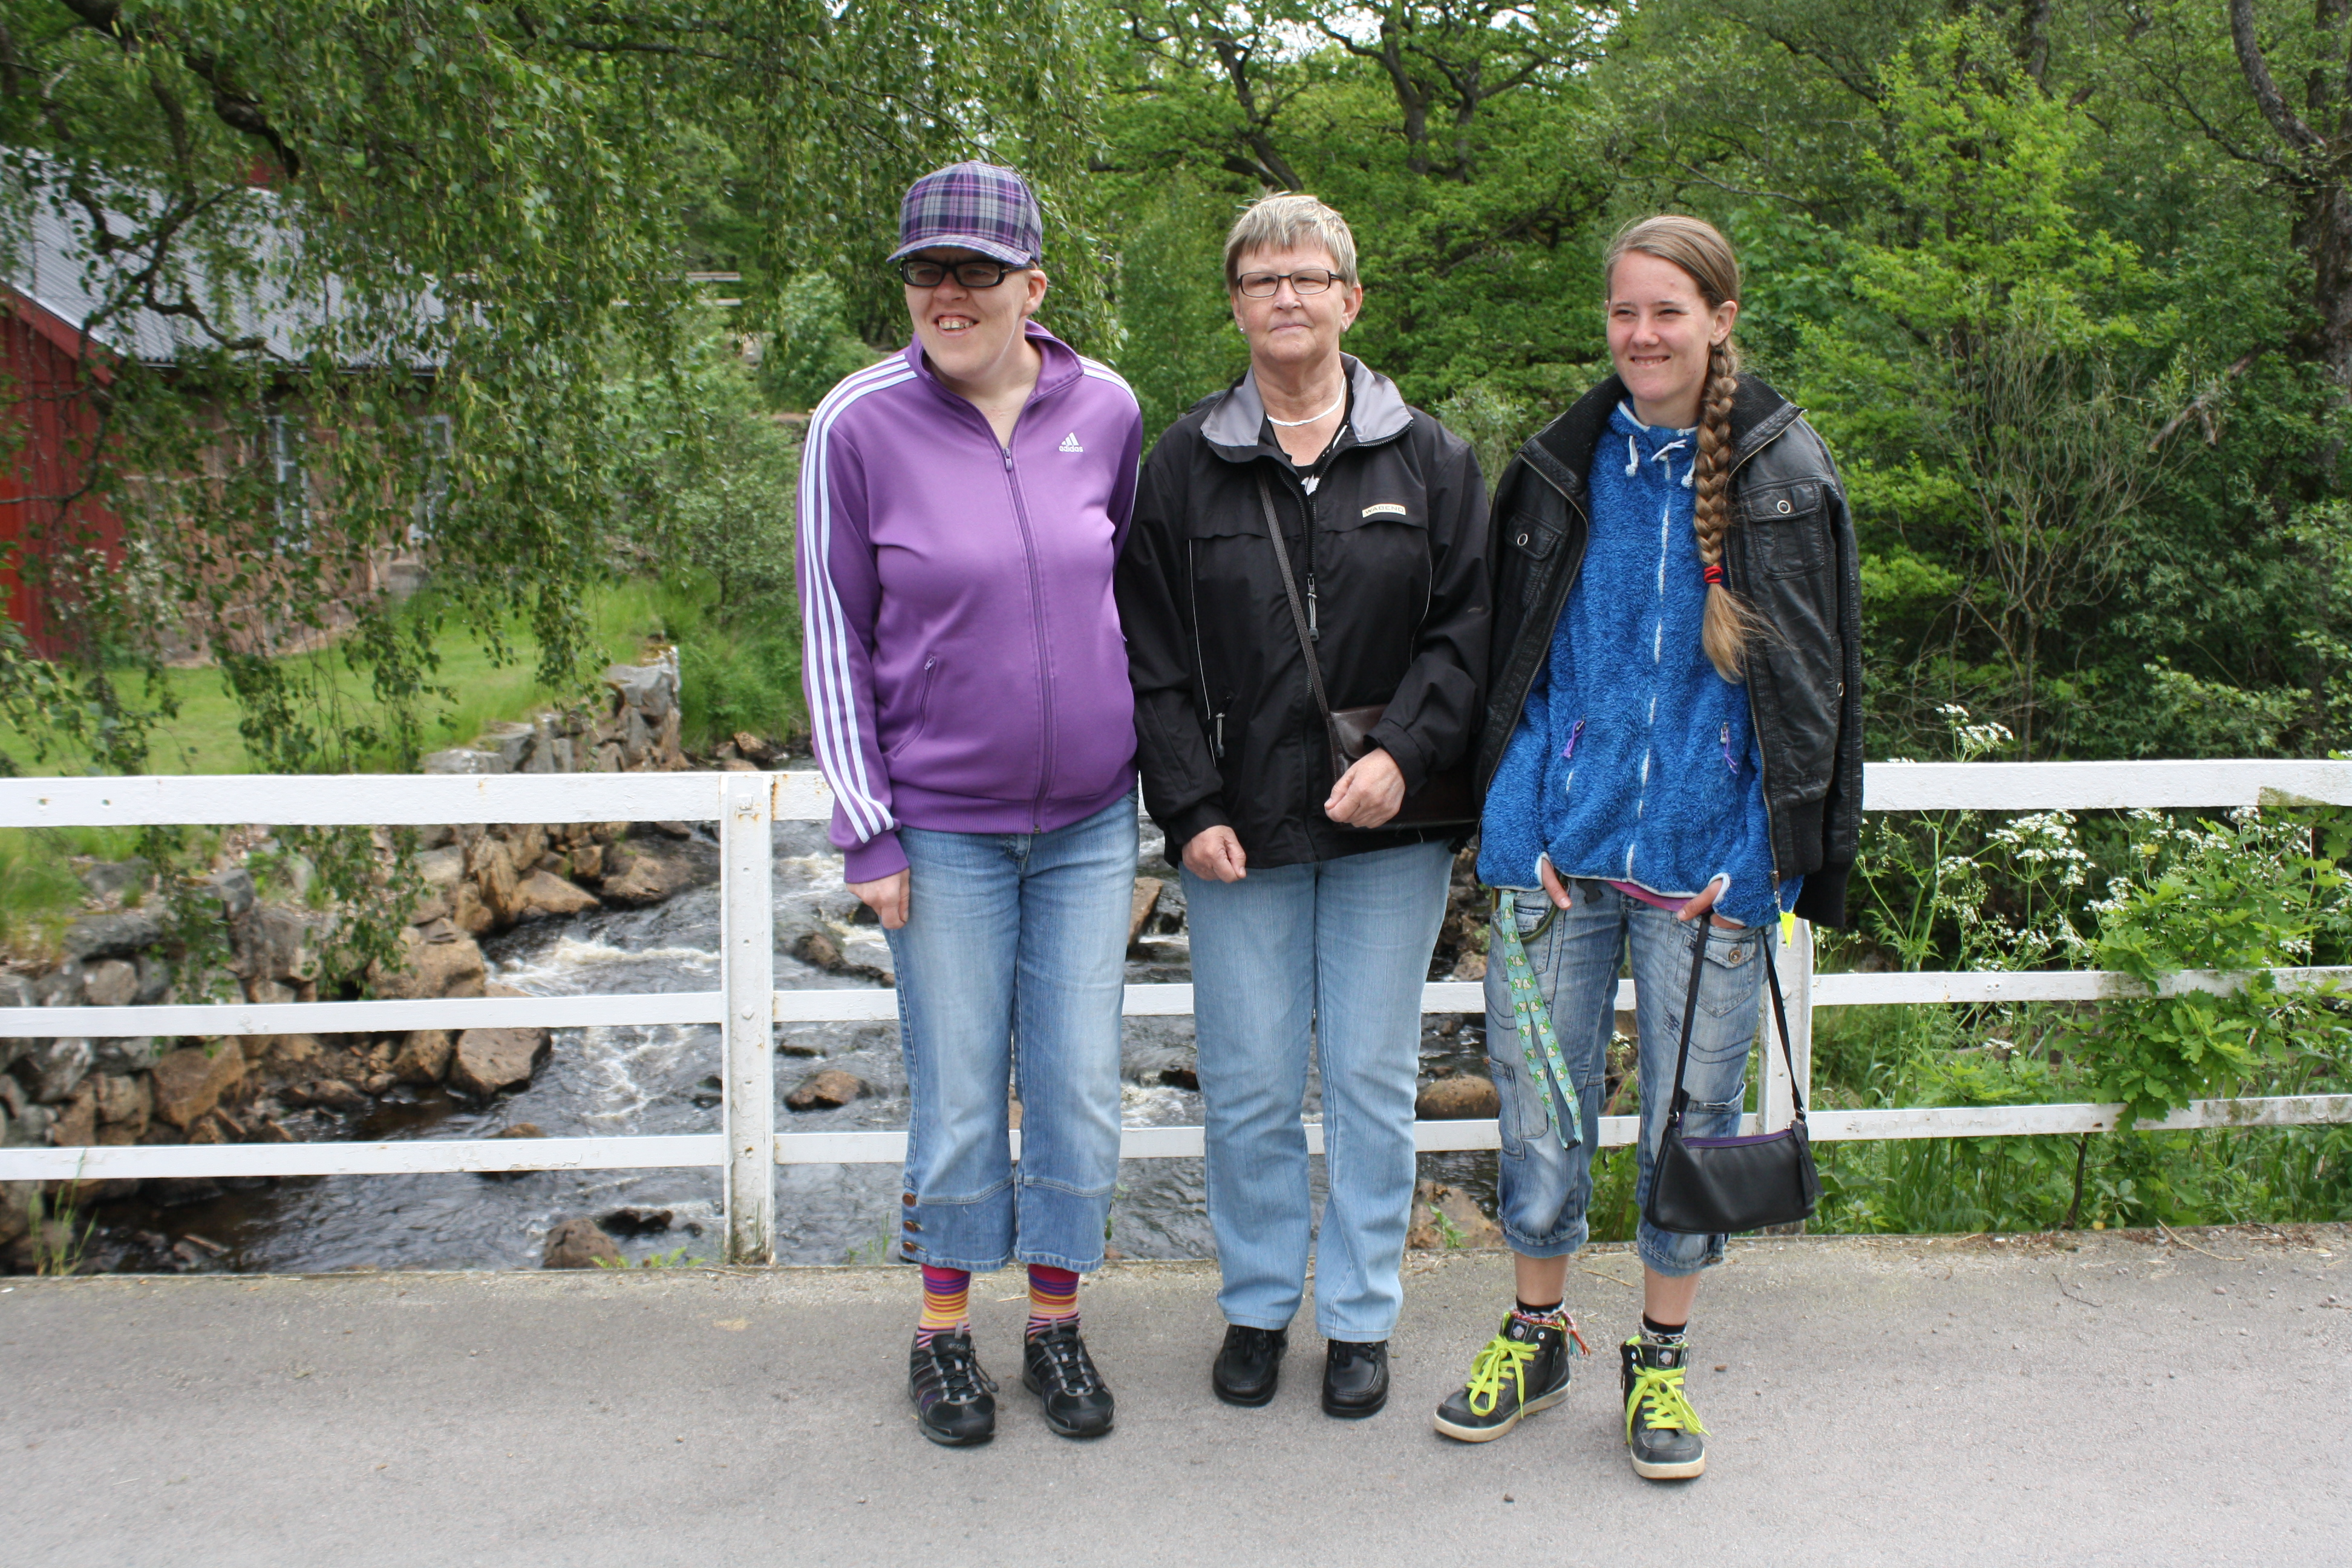 Jenny-Anne, Ann-Louise och Sara